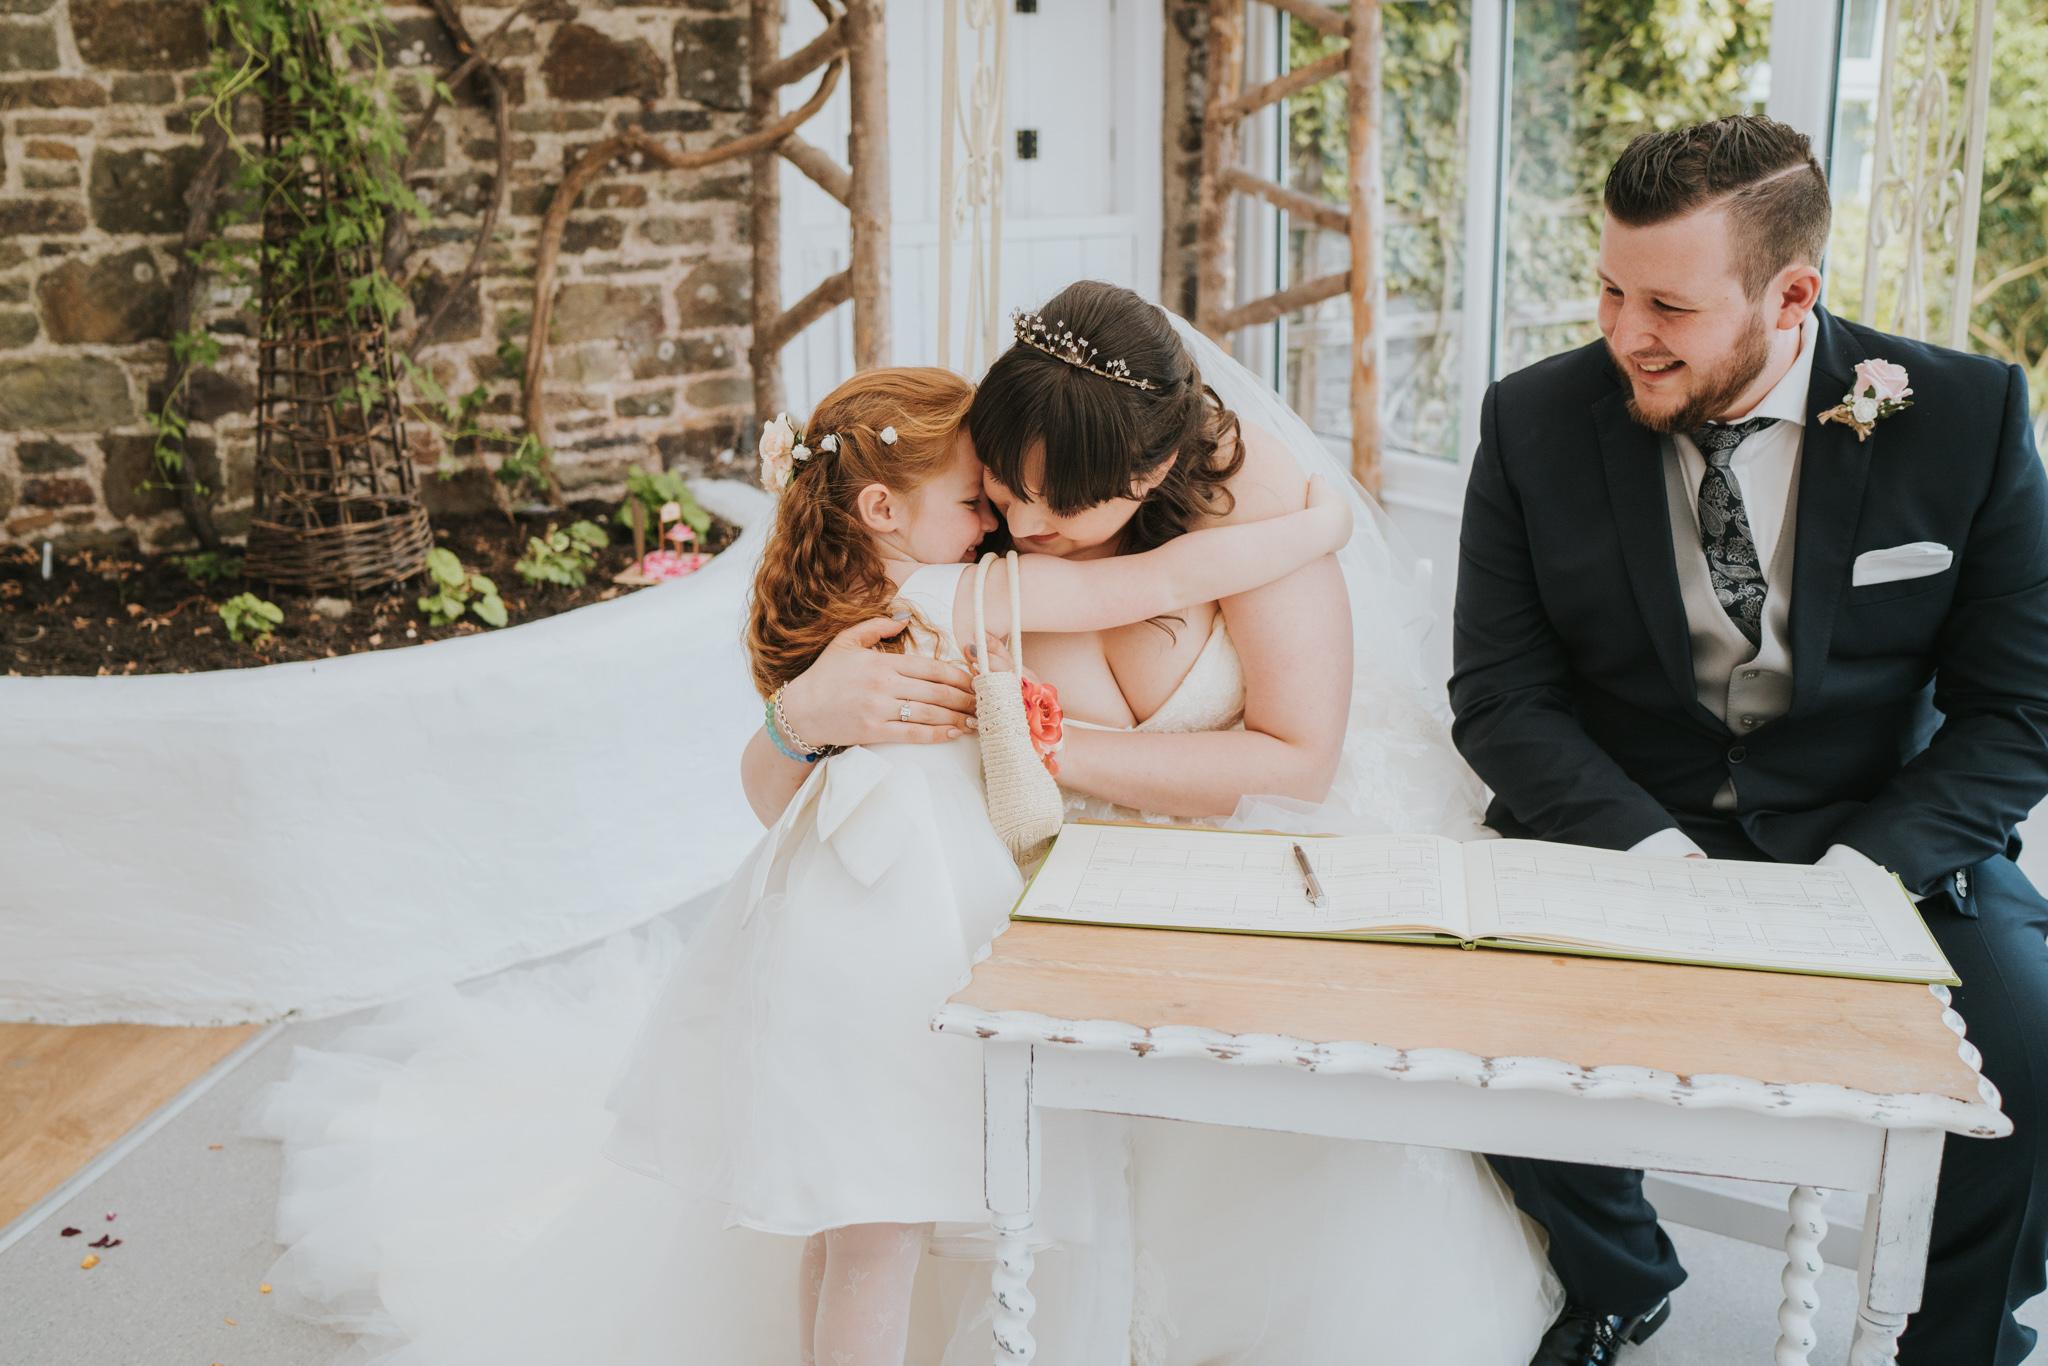 grace-sam-old-barn-clovelly-devon-wedding-photographer-grace-elizabeth-essex-suffolk-norfolk-wedding-photographer (63 of 132).jpg